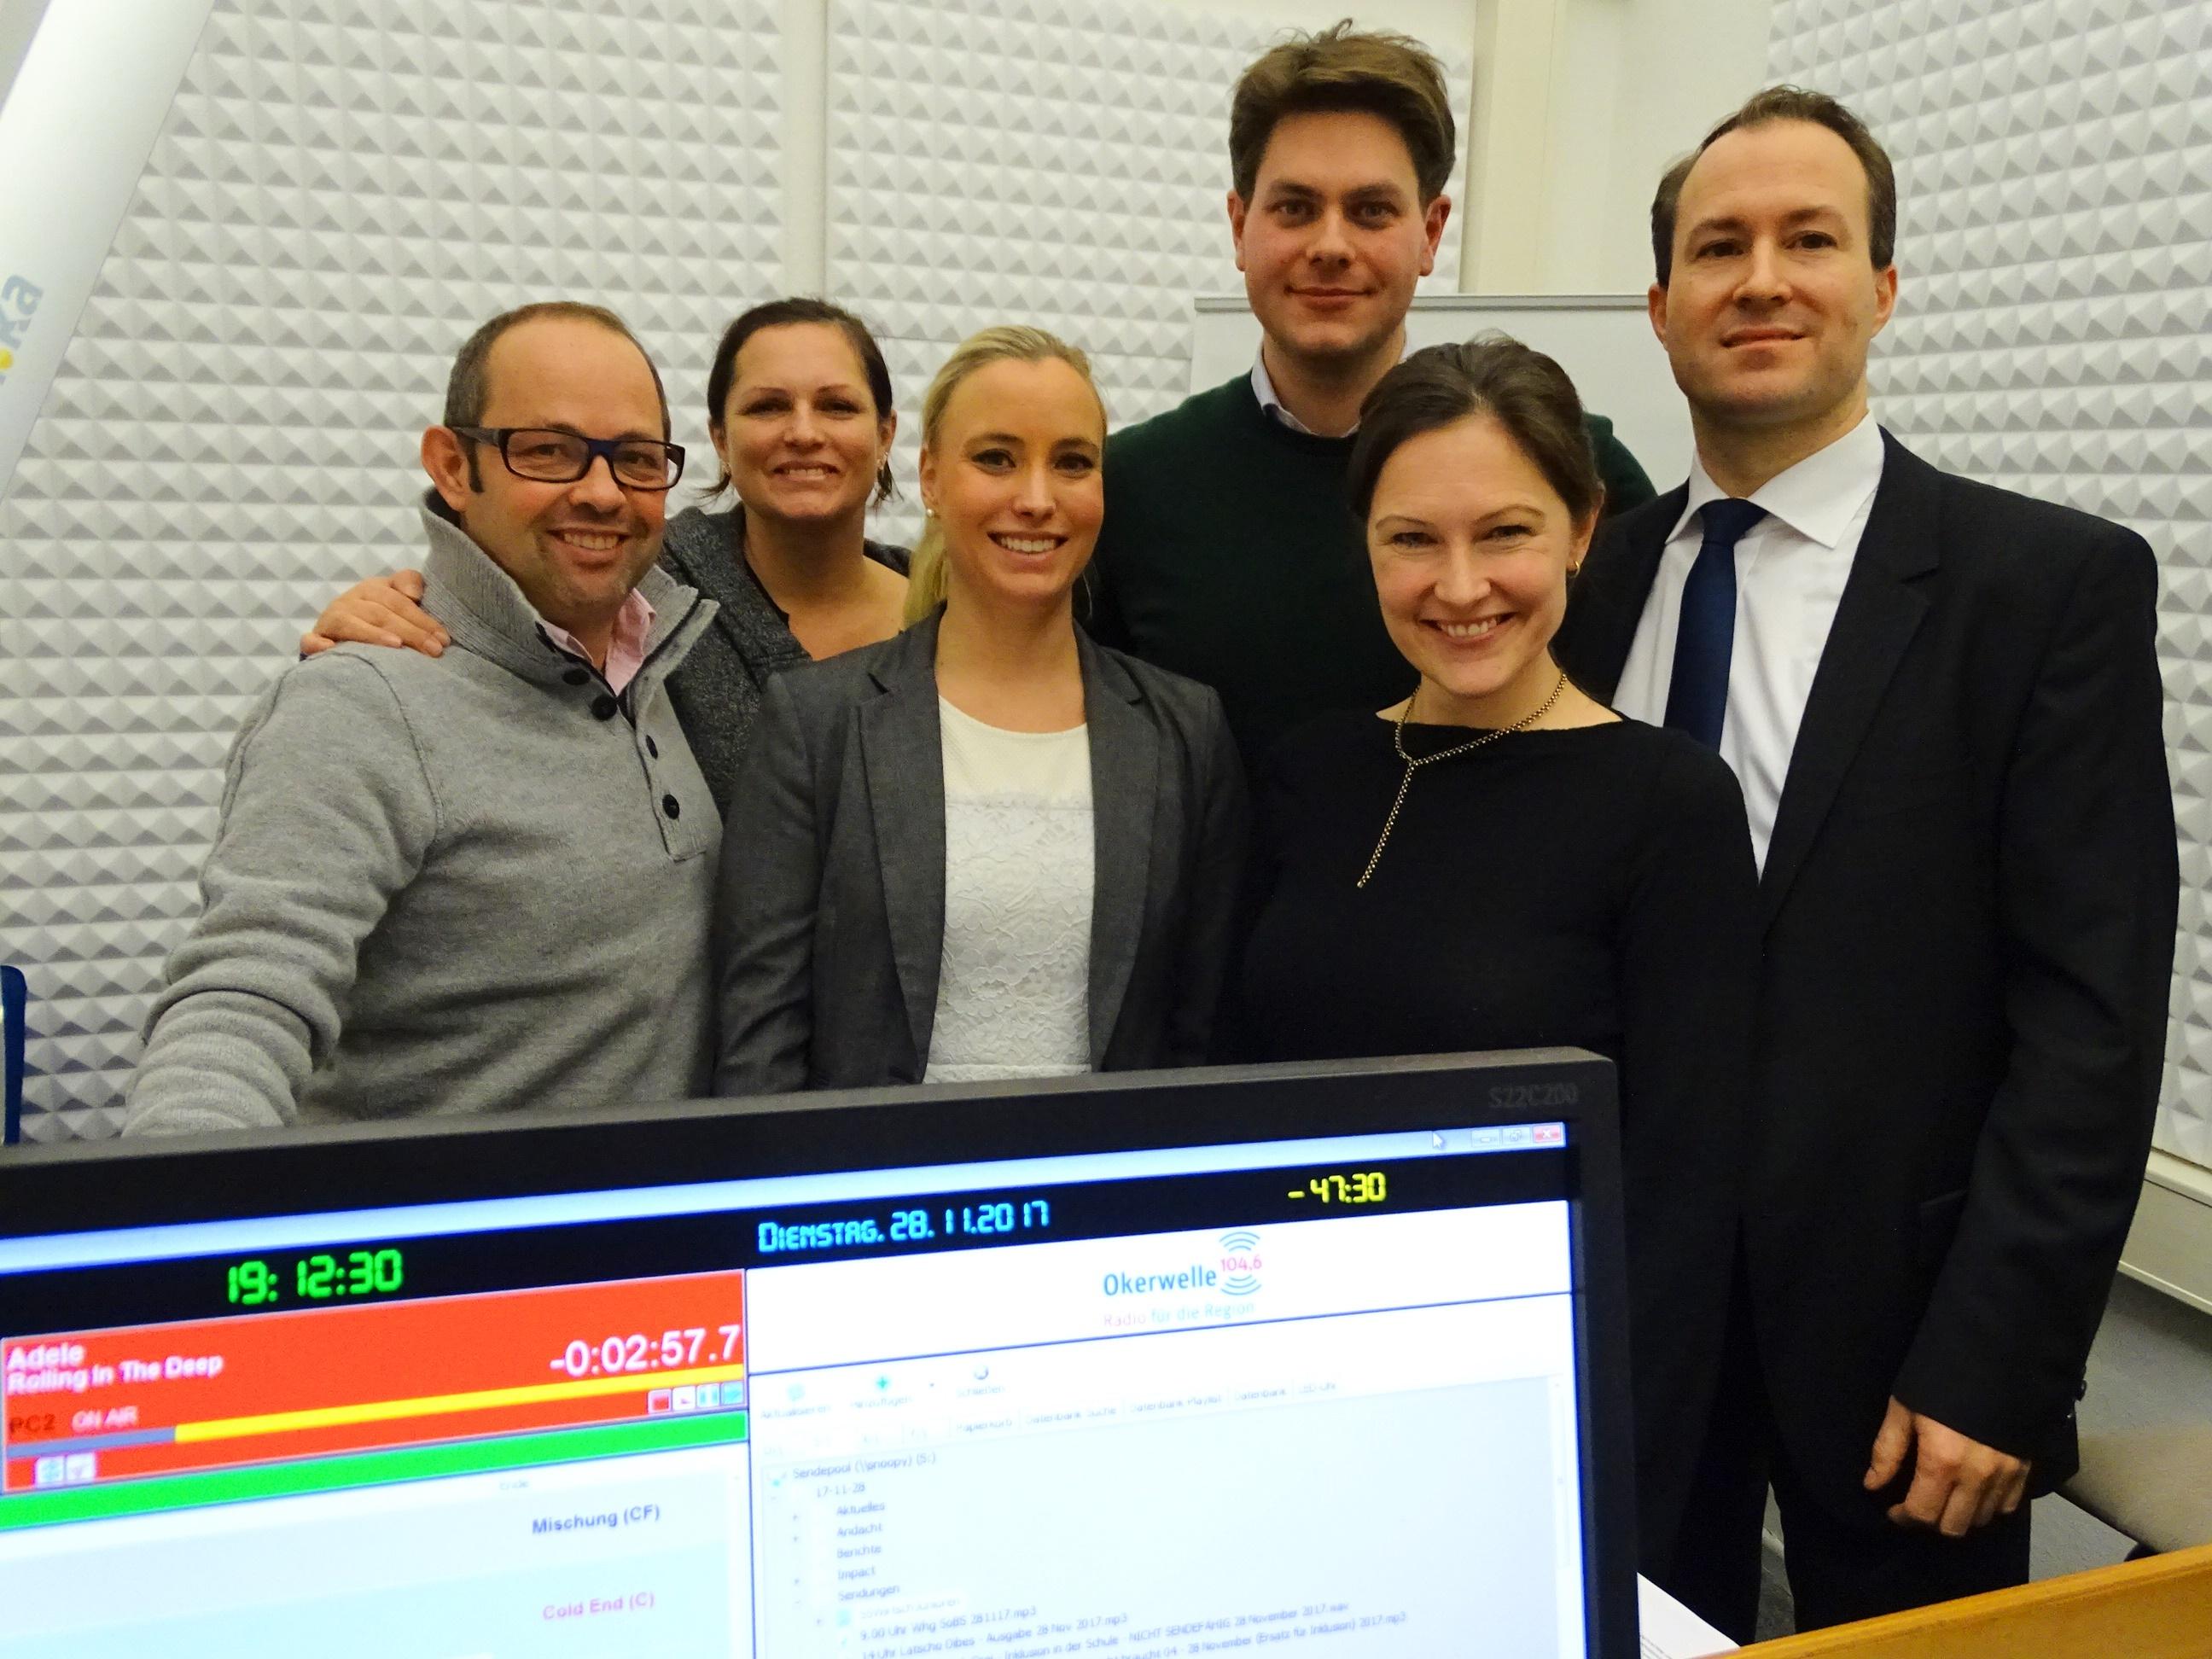 Stiftung_Radio Okerwelle